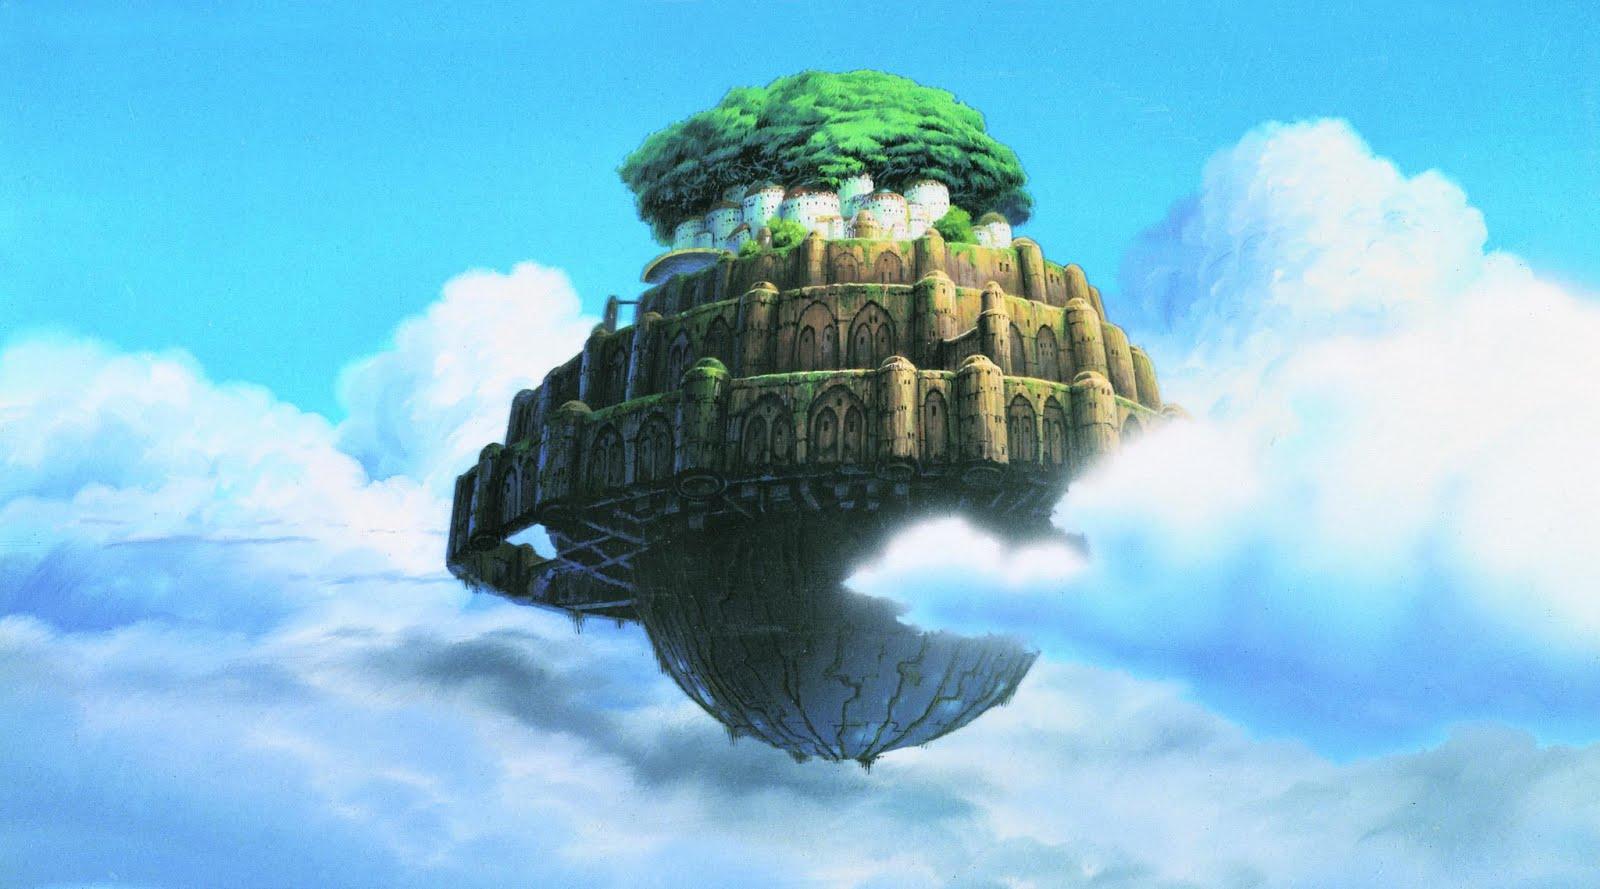 http://images6.fanpop.com/image/photos/33400000/Laputa-castle-in-the-sky-33441778-2048-1138.jpg